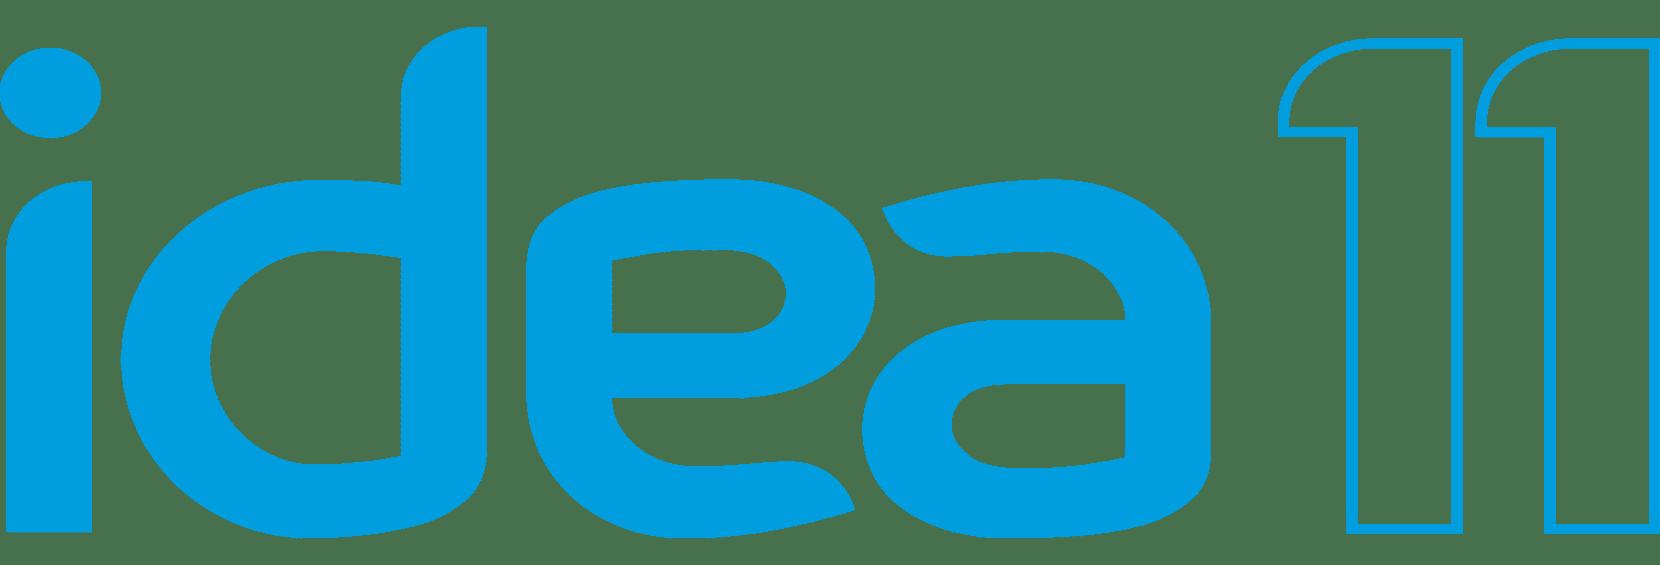 idea11-large-logo2